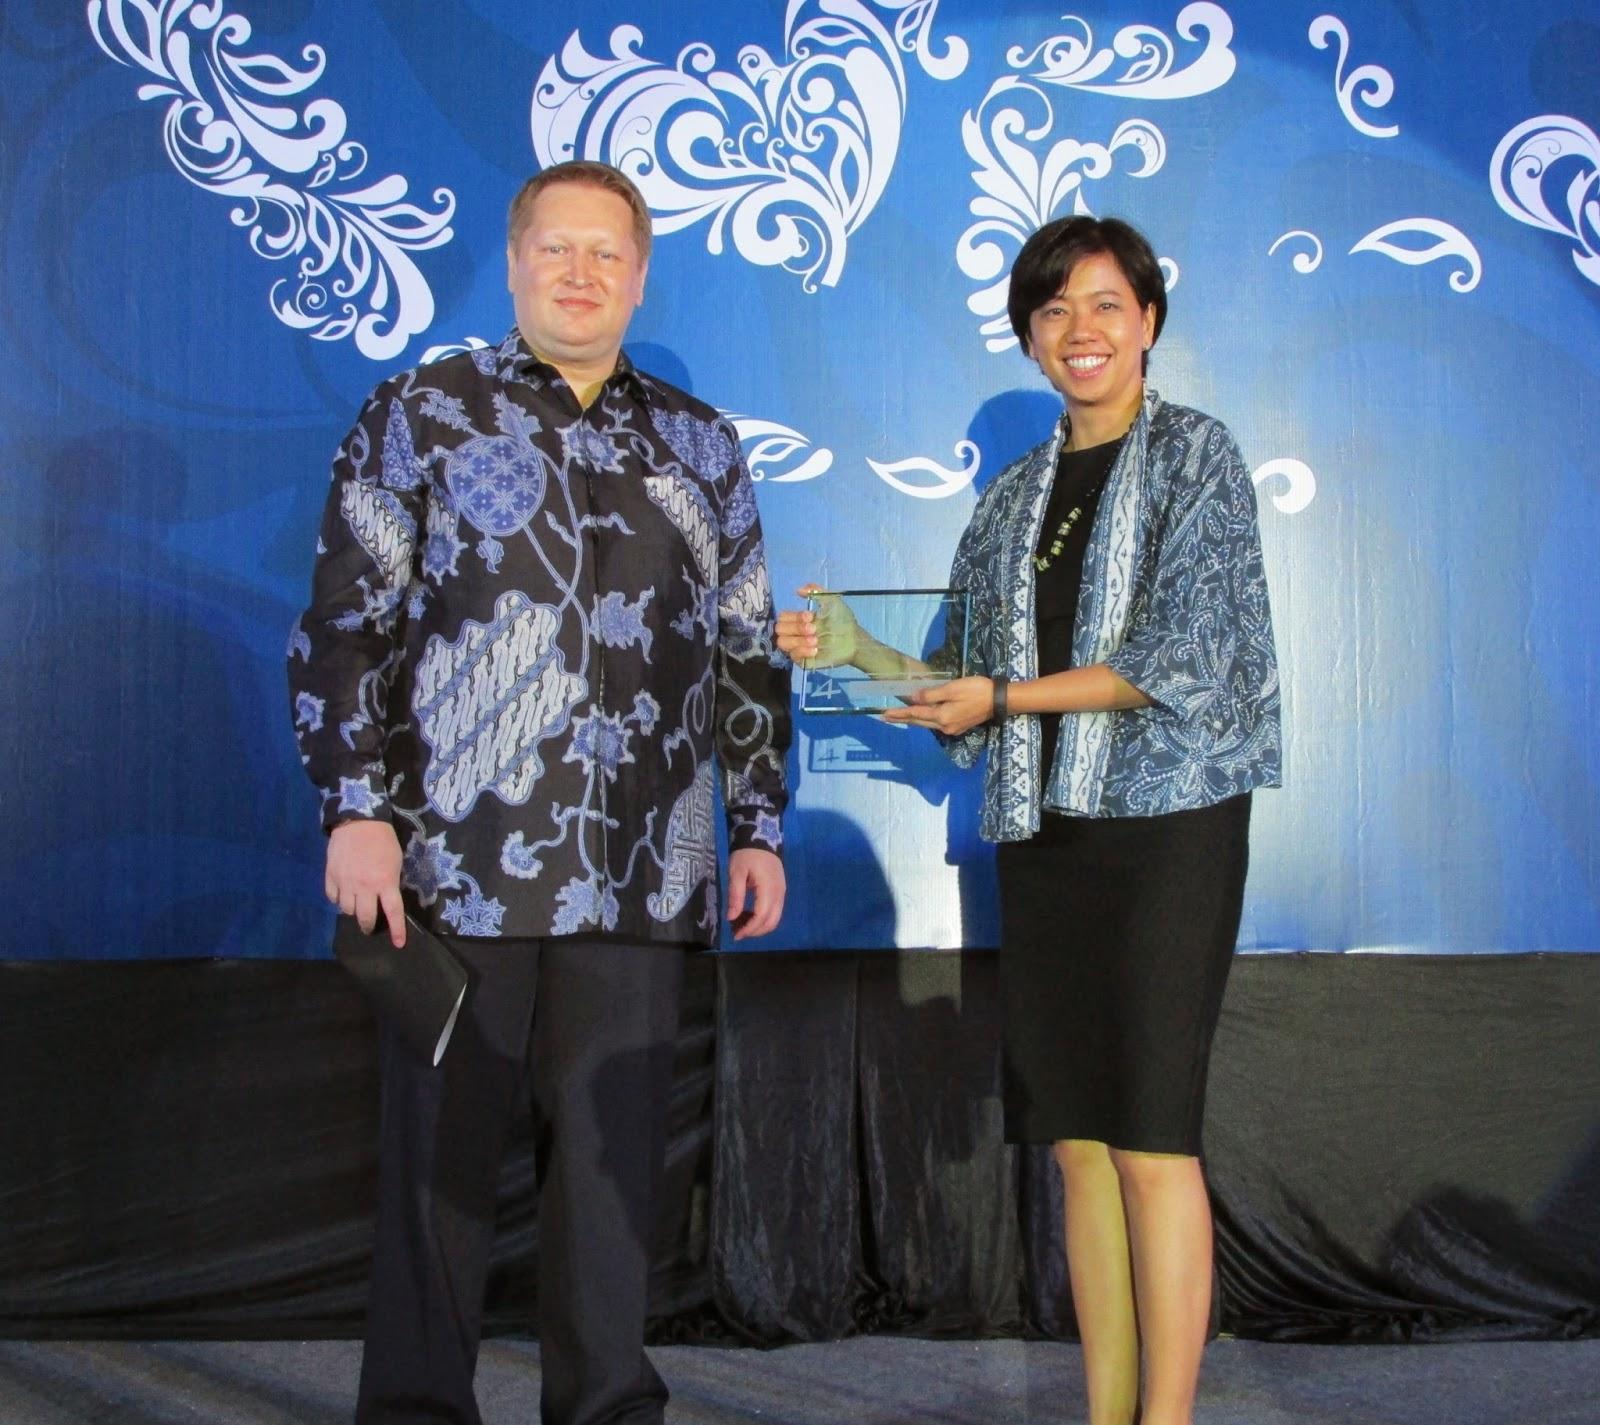 XL Raih Indonesia Mobile Digital Service Provider